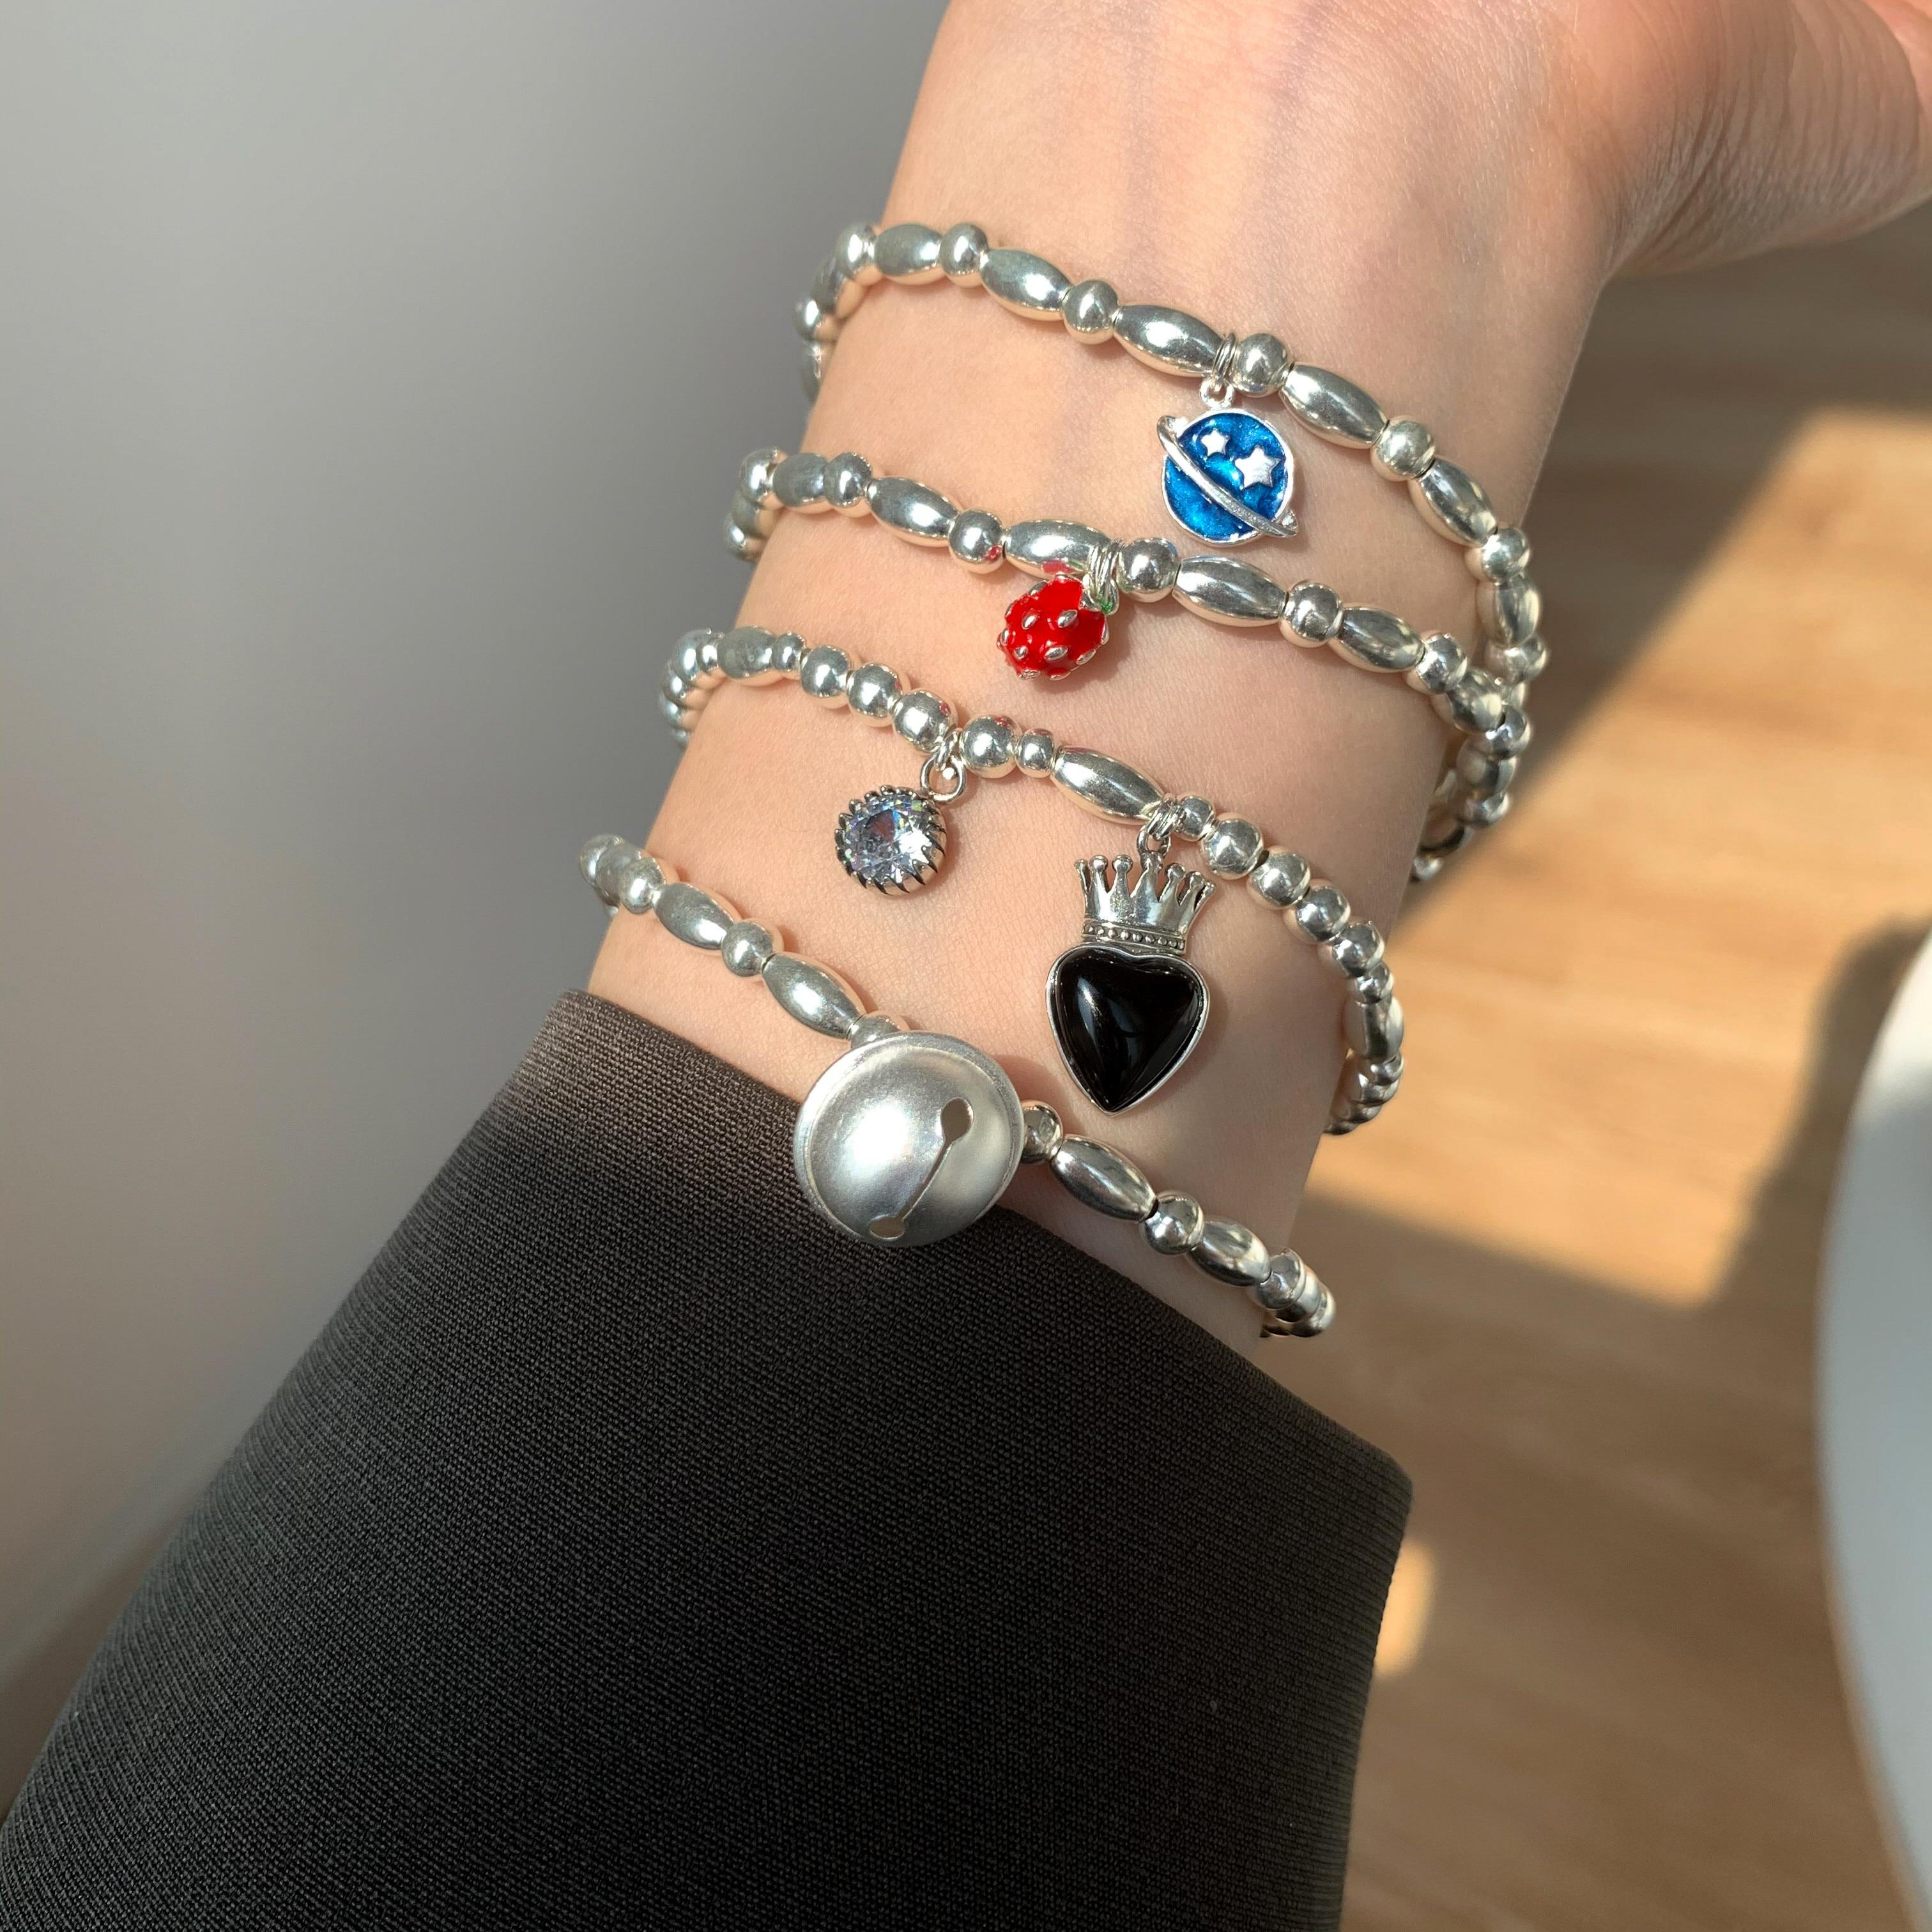 For the Evening Rice Bead Bracelet Female Sterling Silver Temperamental Advanced Elegant Niche Ins H